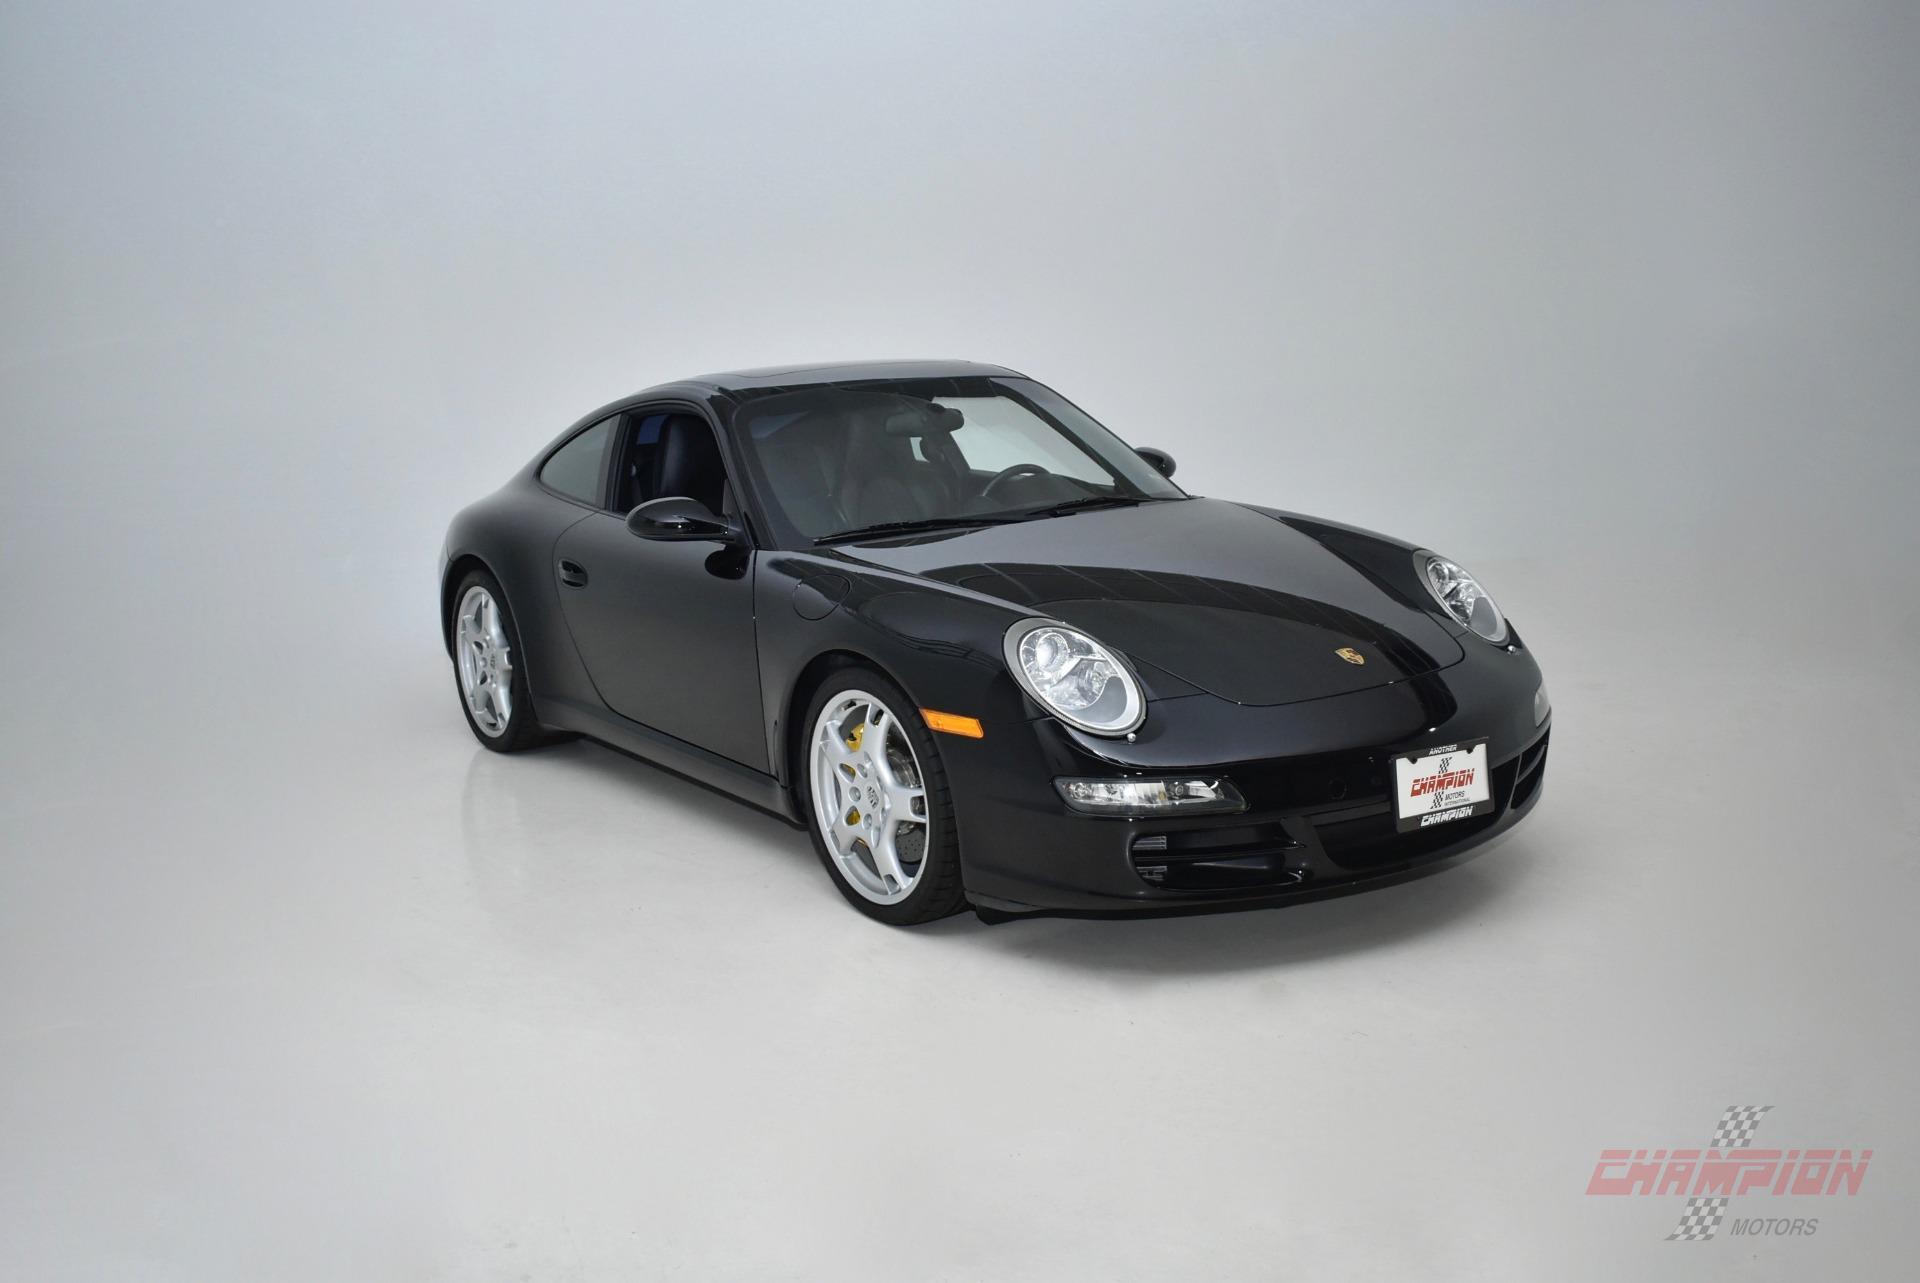 2005 Porsche 911 Carrera S - Champion Motors International ...